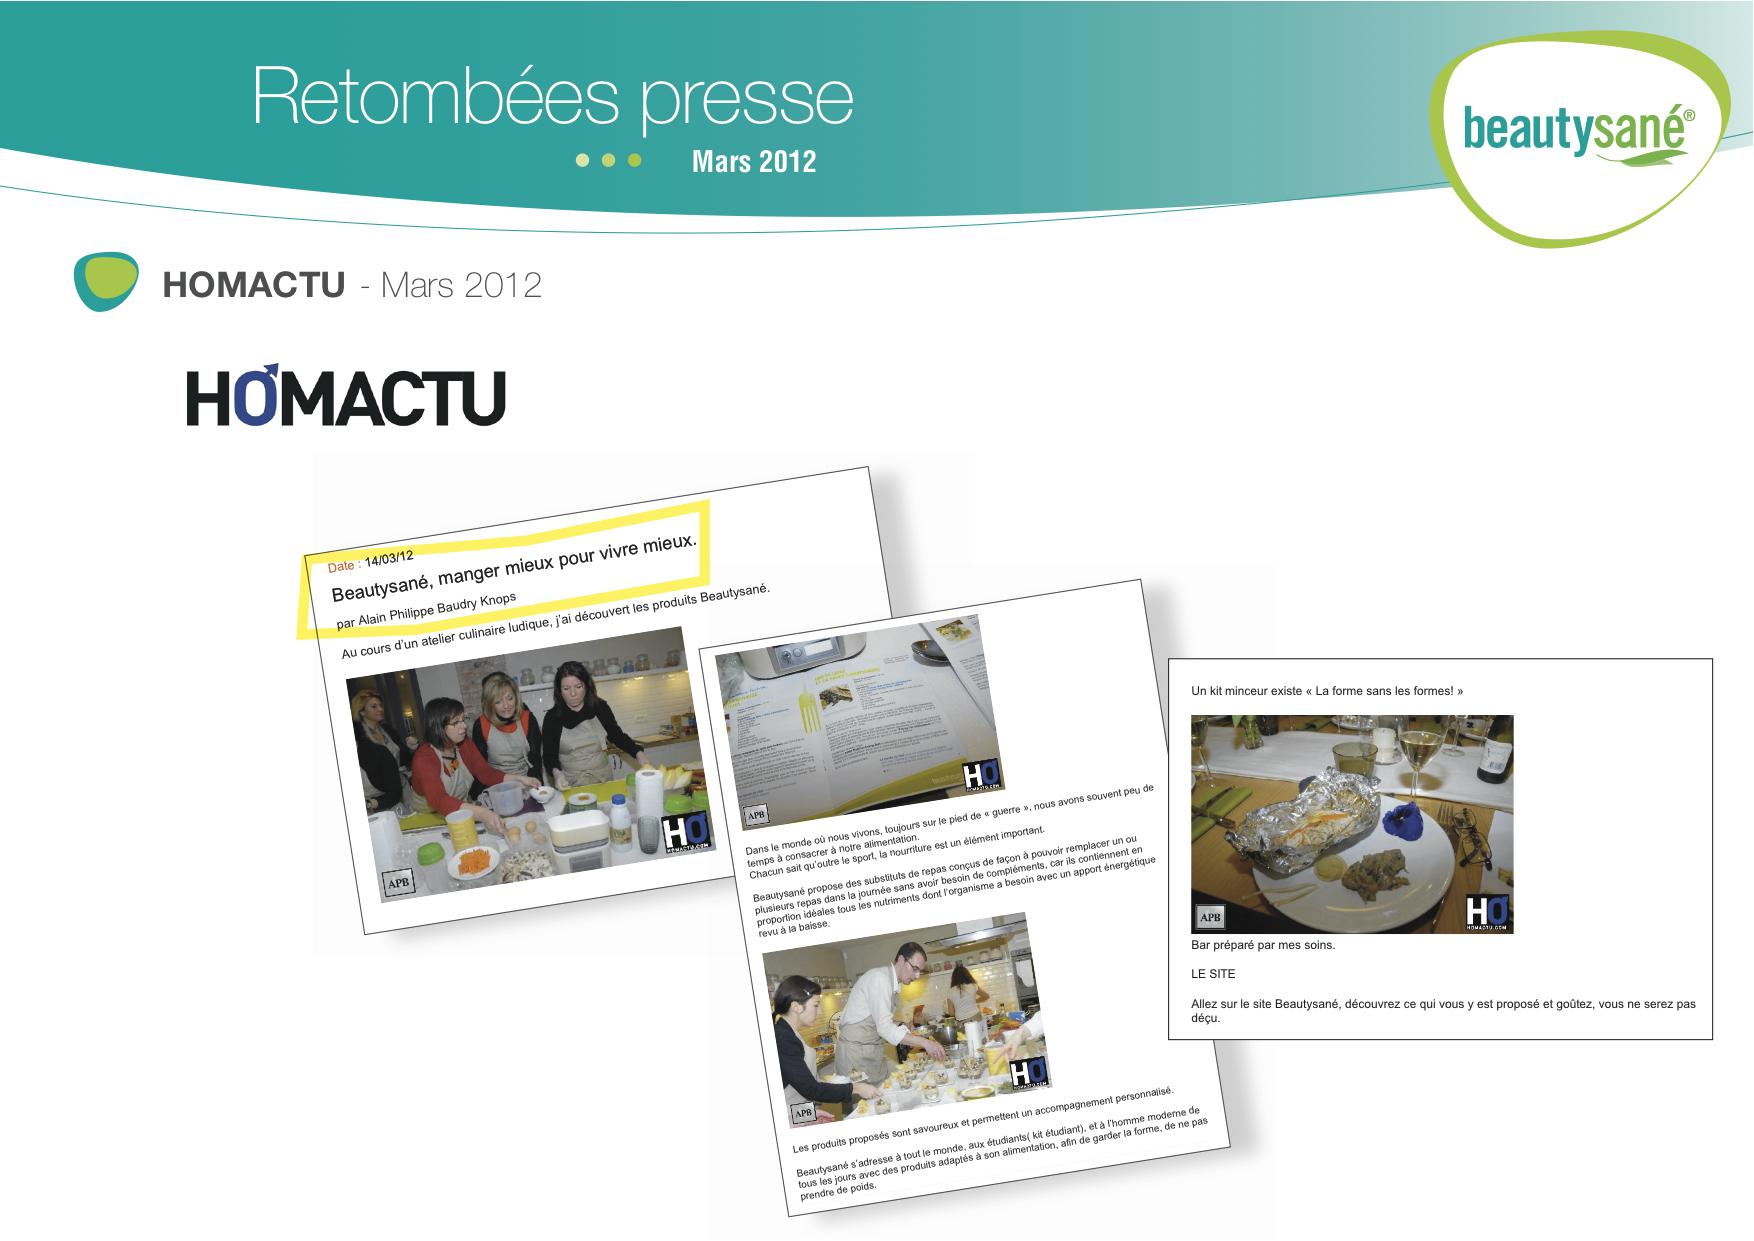 rp_bs-mar2012-homactu